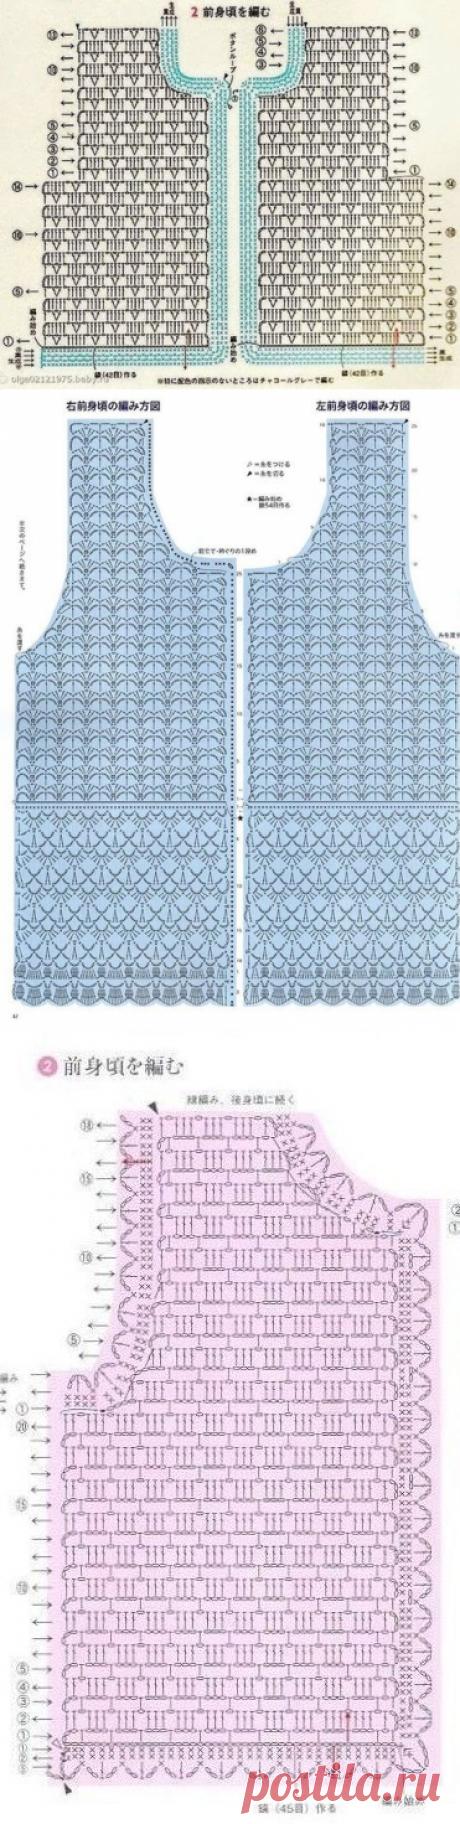 Diy Crafts Freeform Crochet Como Fazer Um Vestido 760967668273032842 P - Diy Crafts - hadido